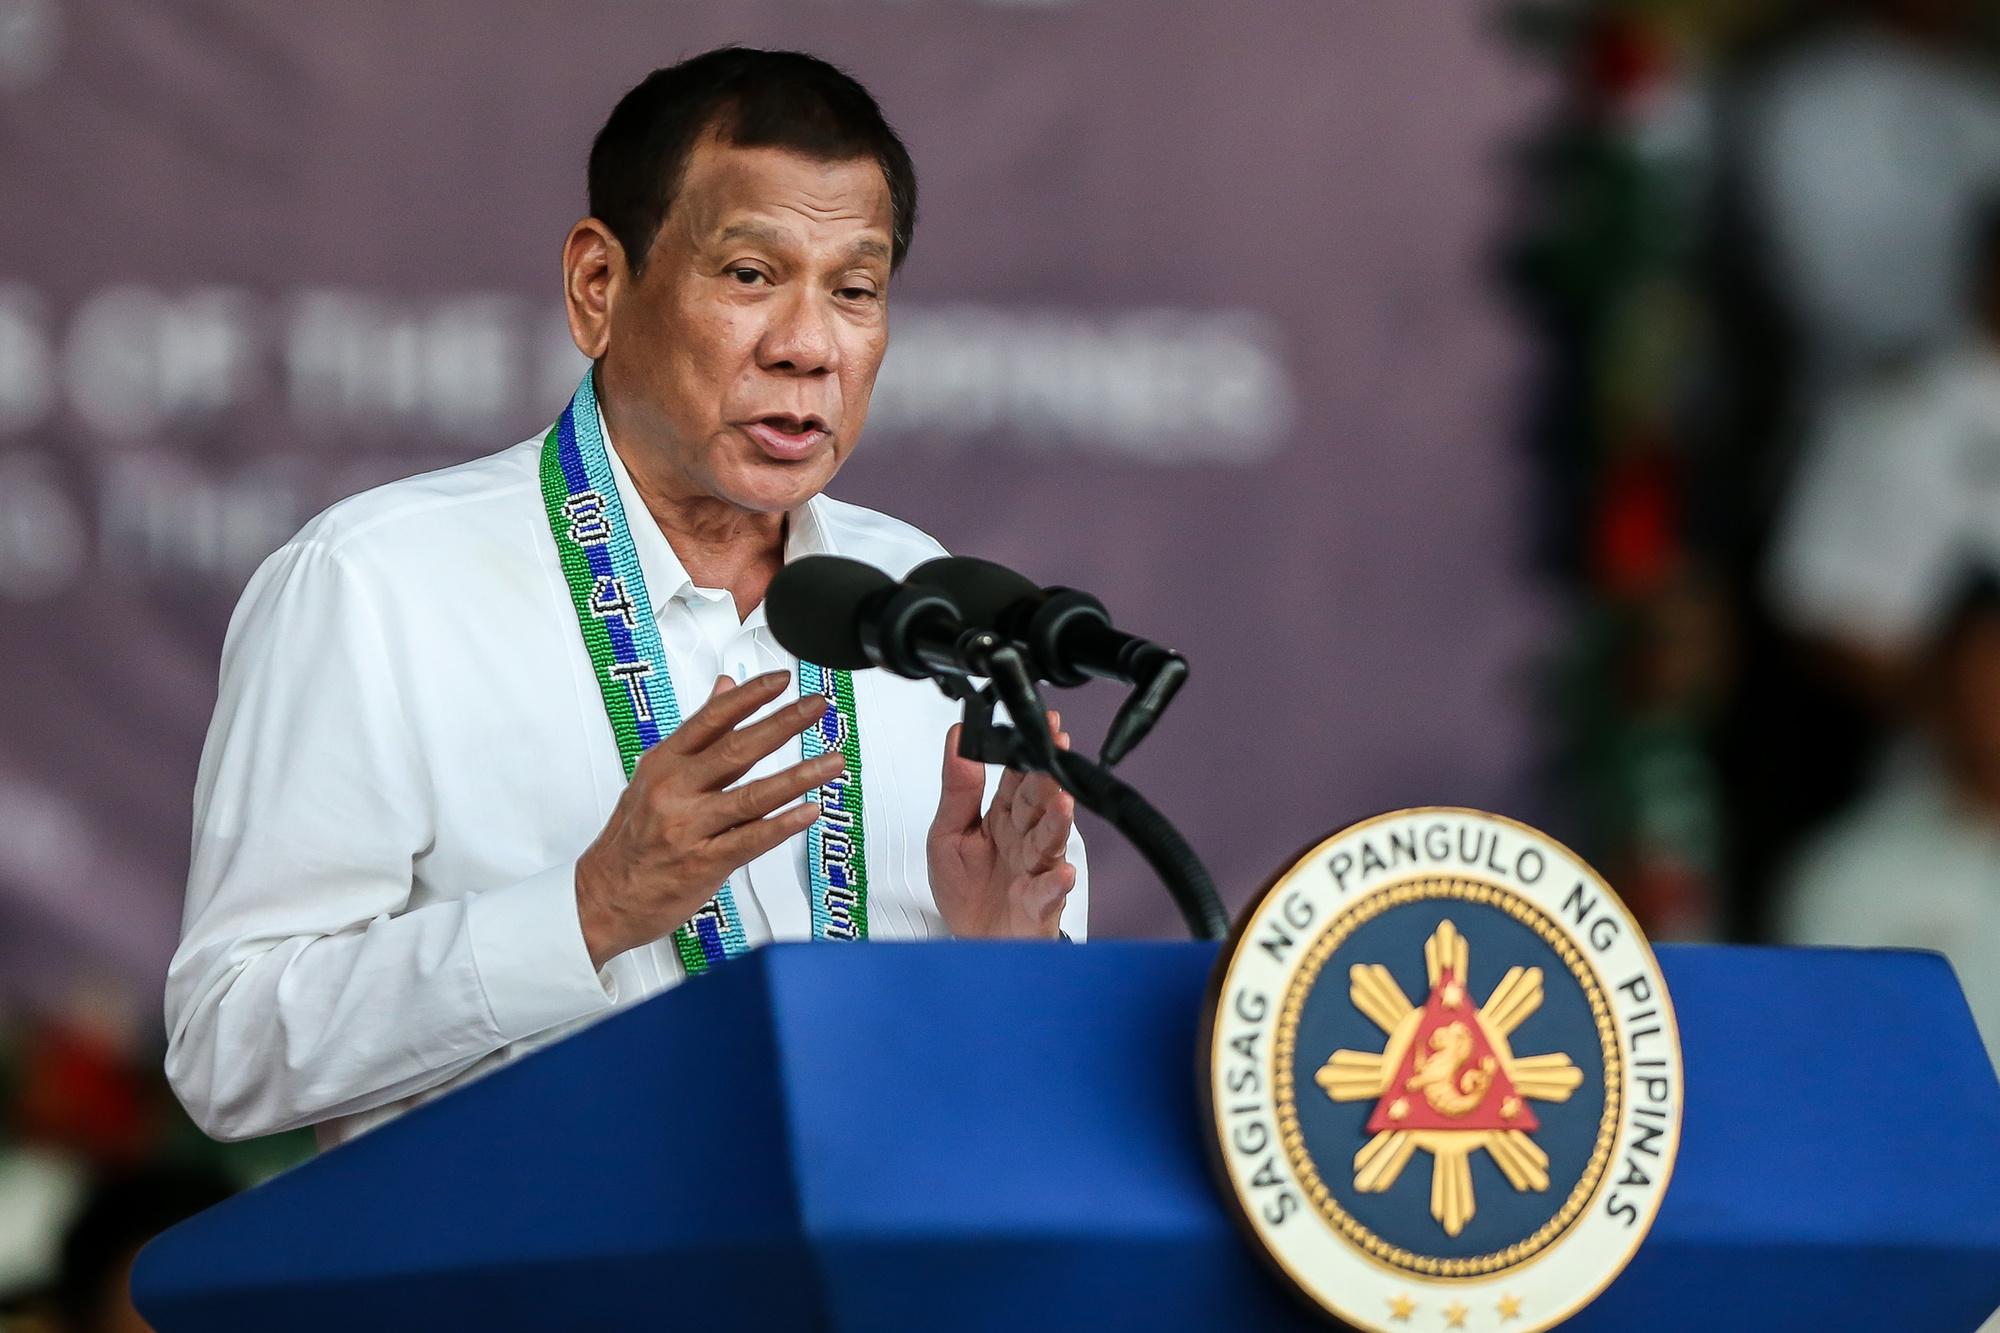 Filipijns president Rodrigo Duterte, Belga Image